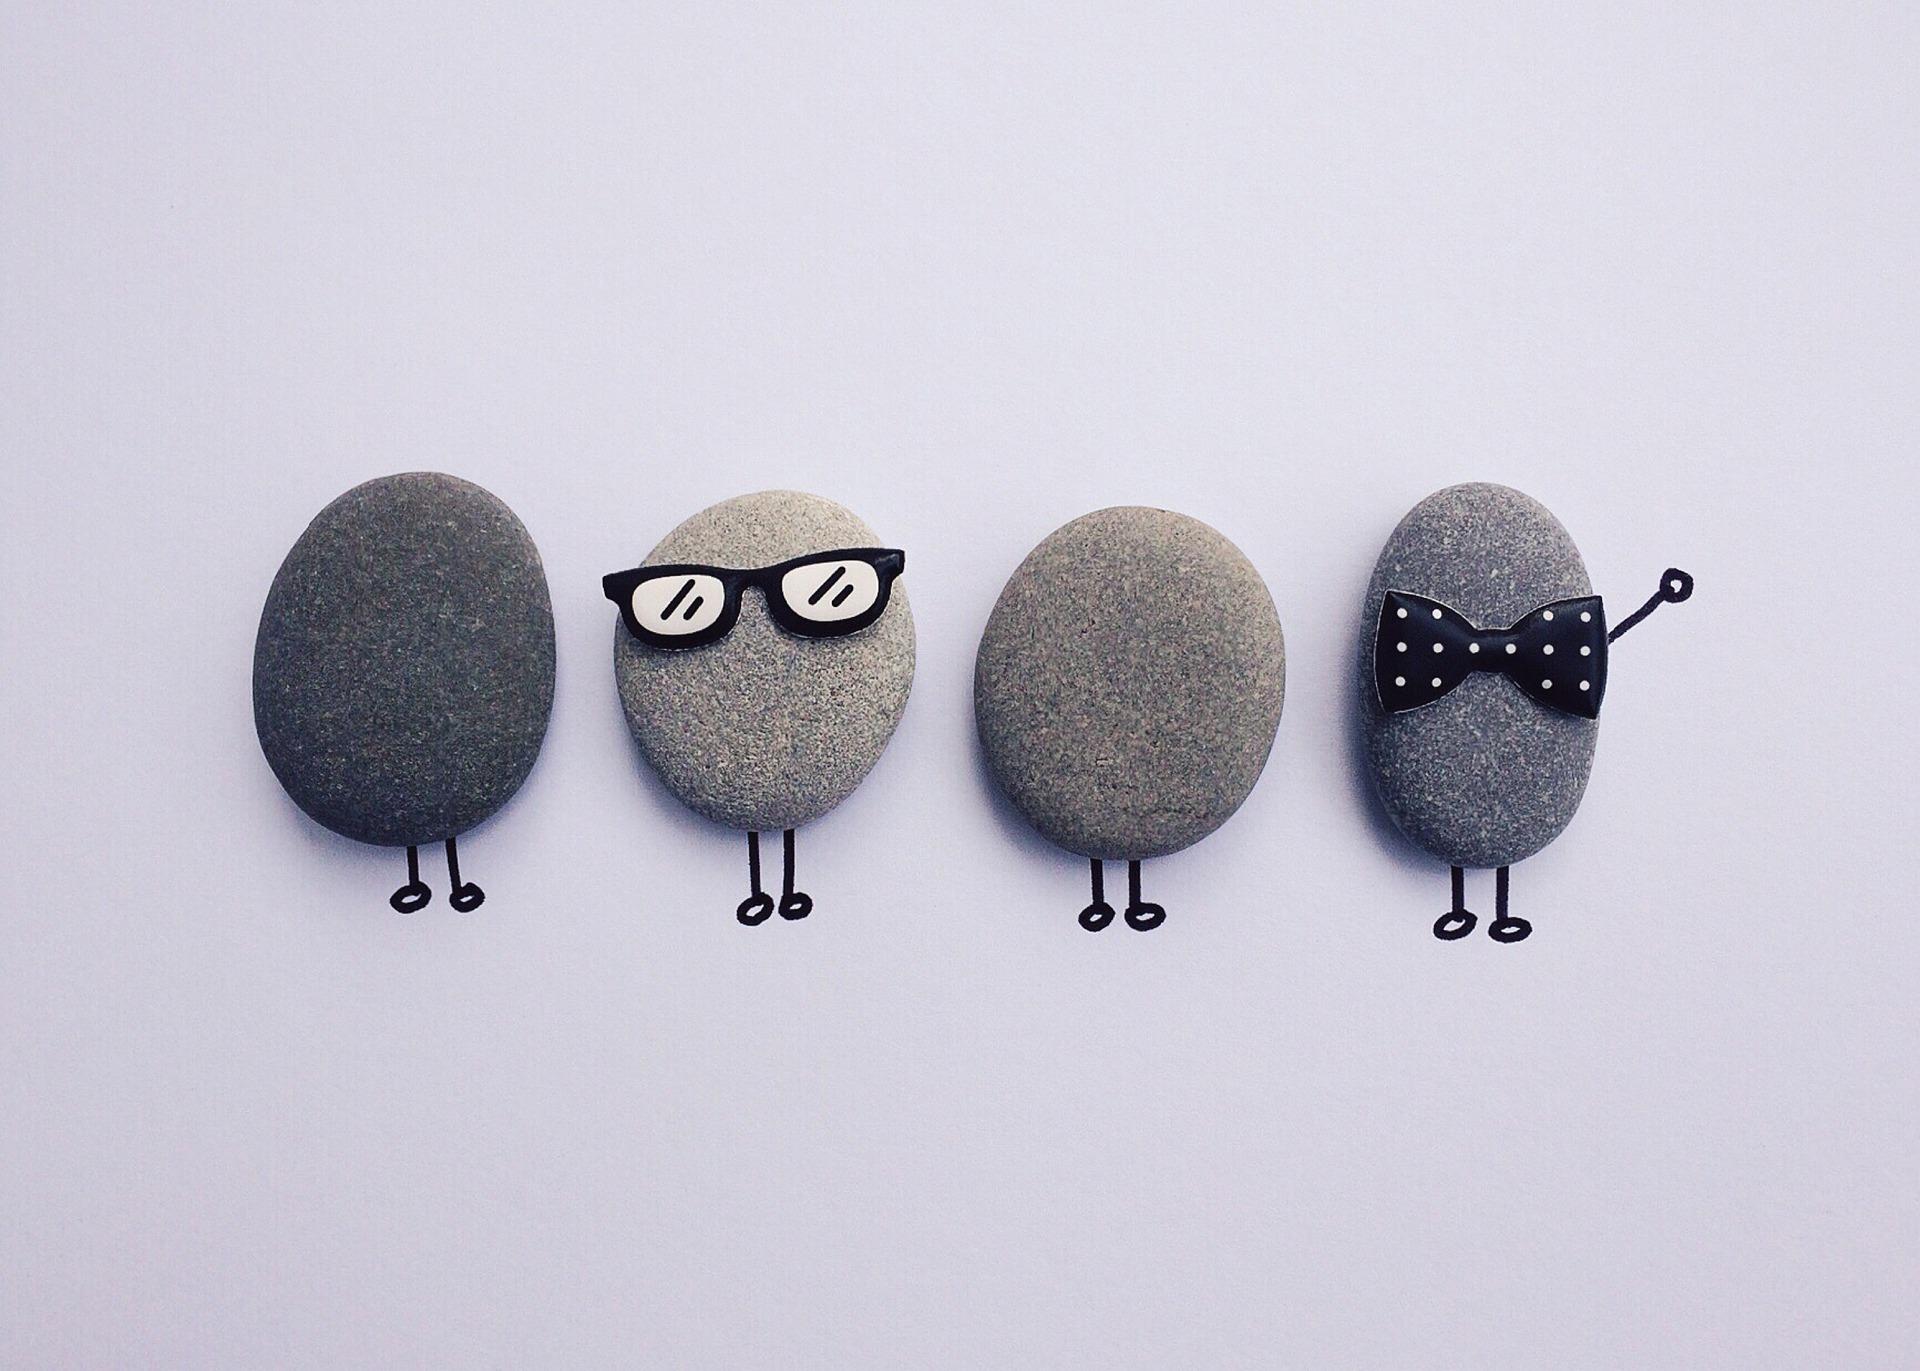 Etapy procesu rekrutacyjnego